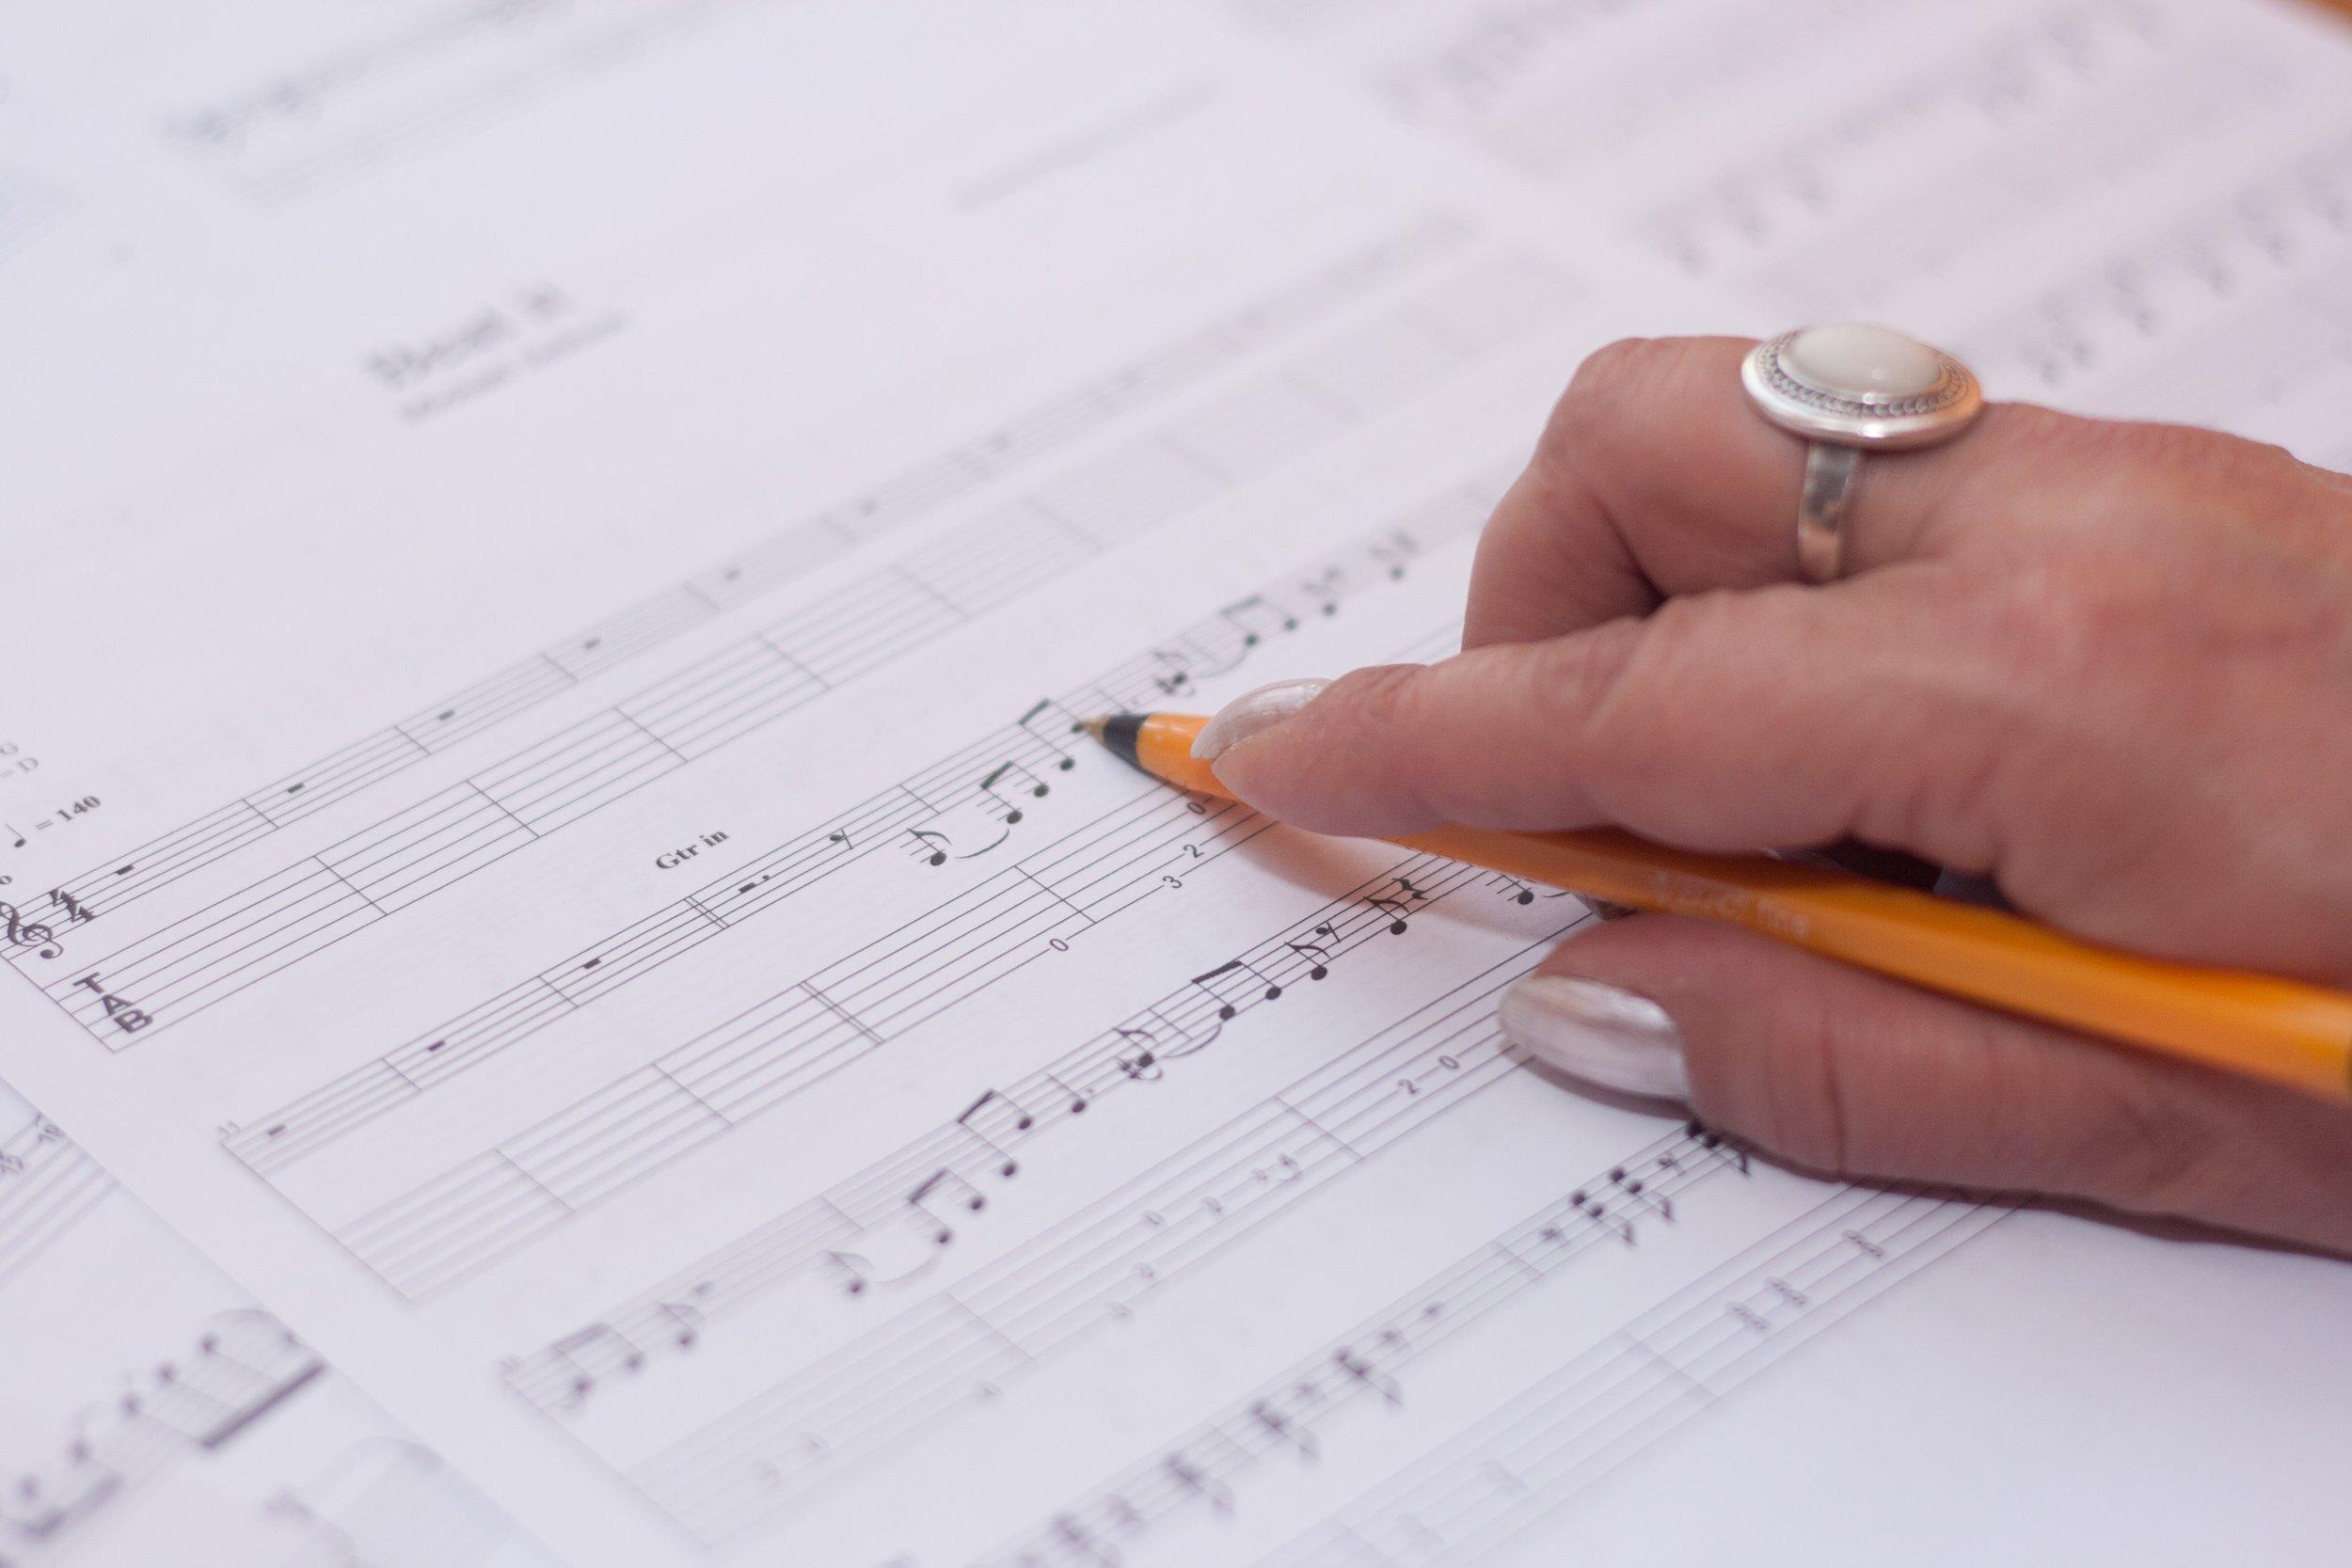 compose-hand-music-3090.jpg